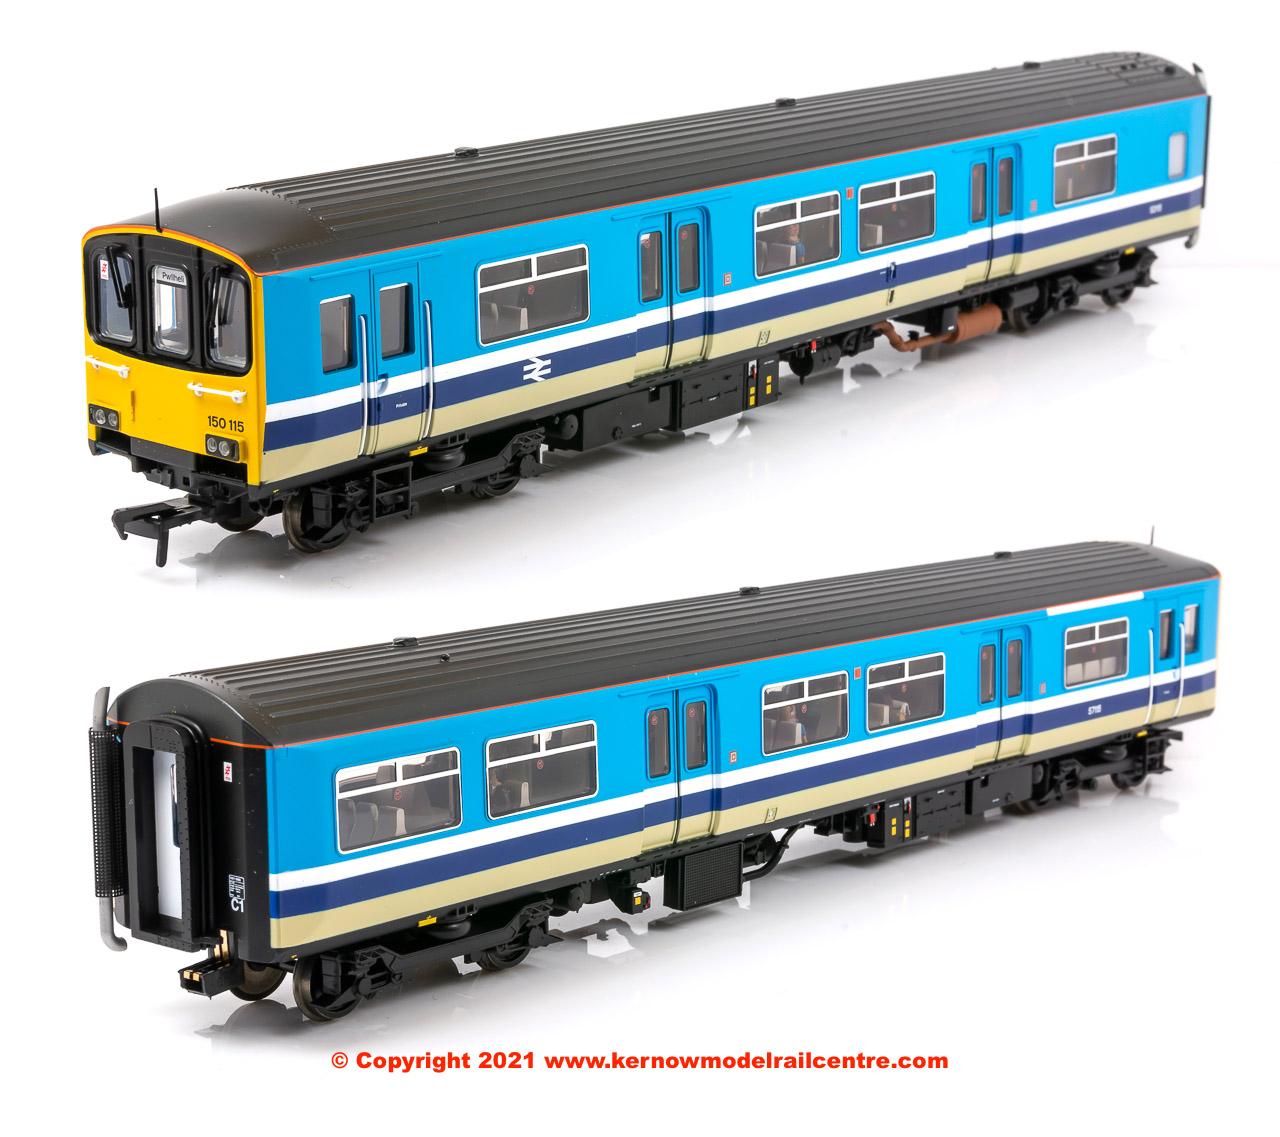 32-929 Bachmann Class 150/1 2 Car Sprinter DMU number 150 115 Image